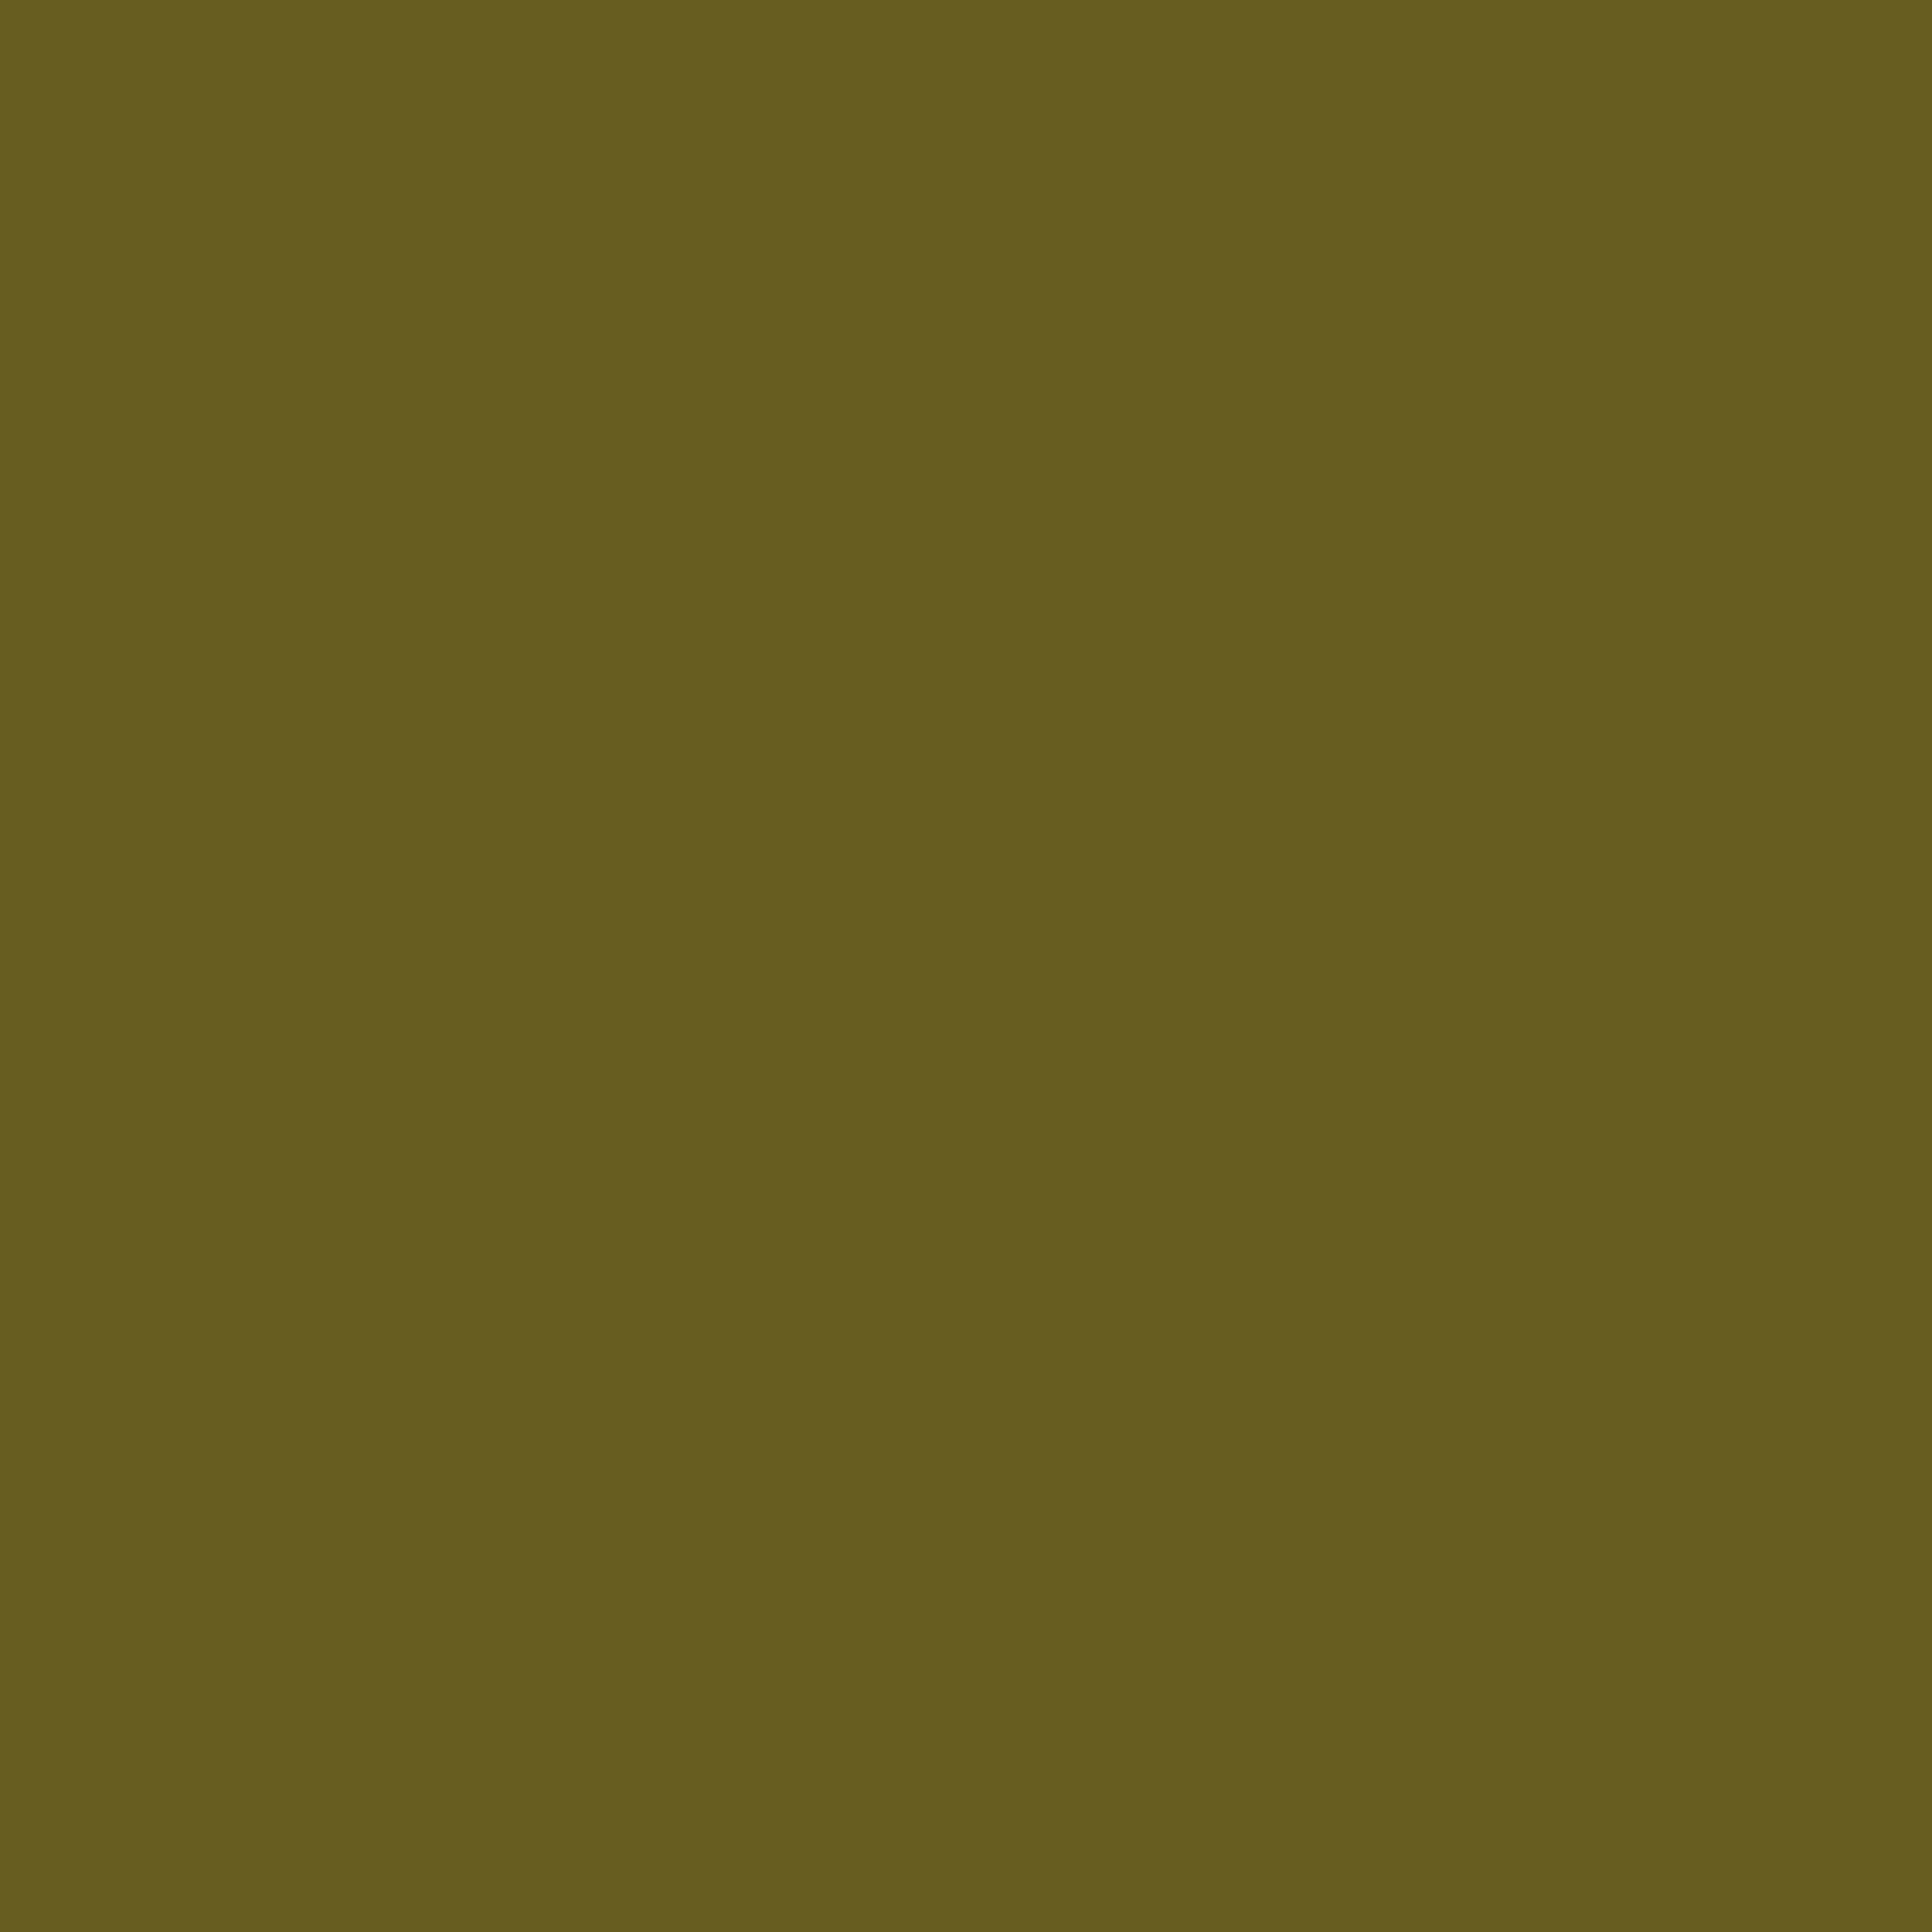 2048x2048 Antique Bronze Solid Color Background